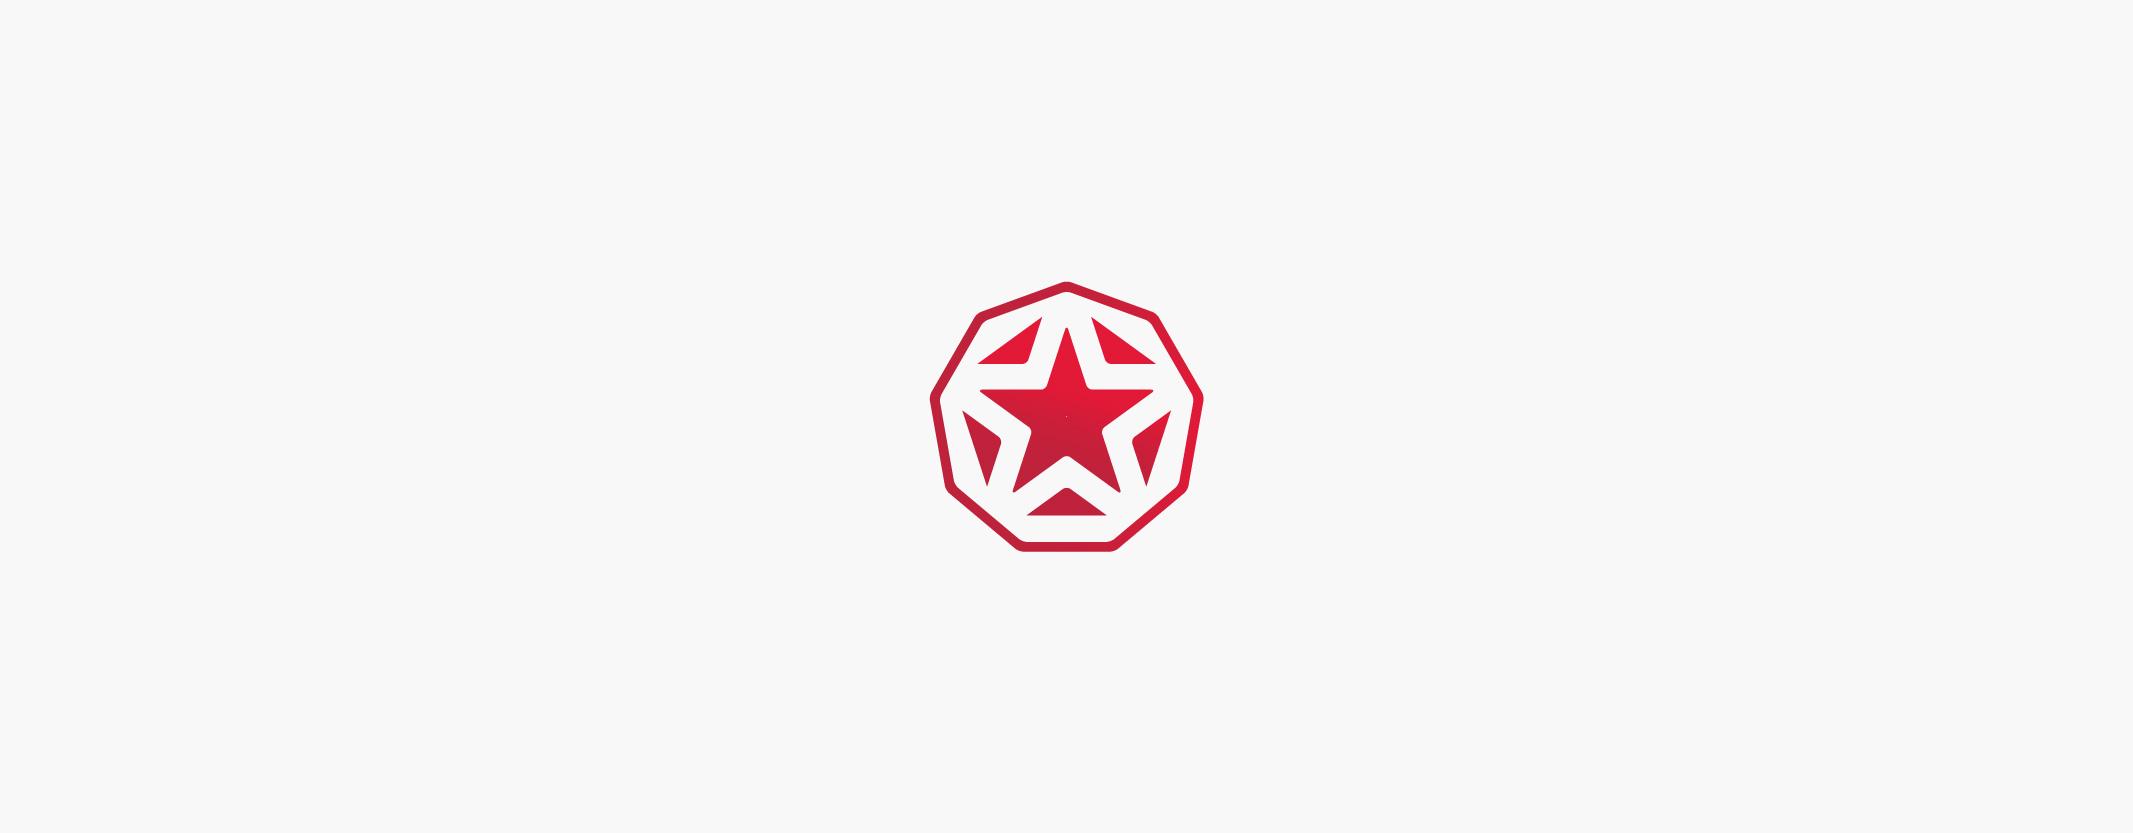 33_logos_newdeal